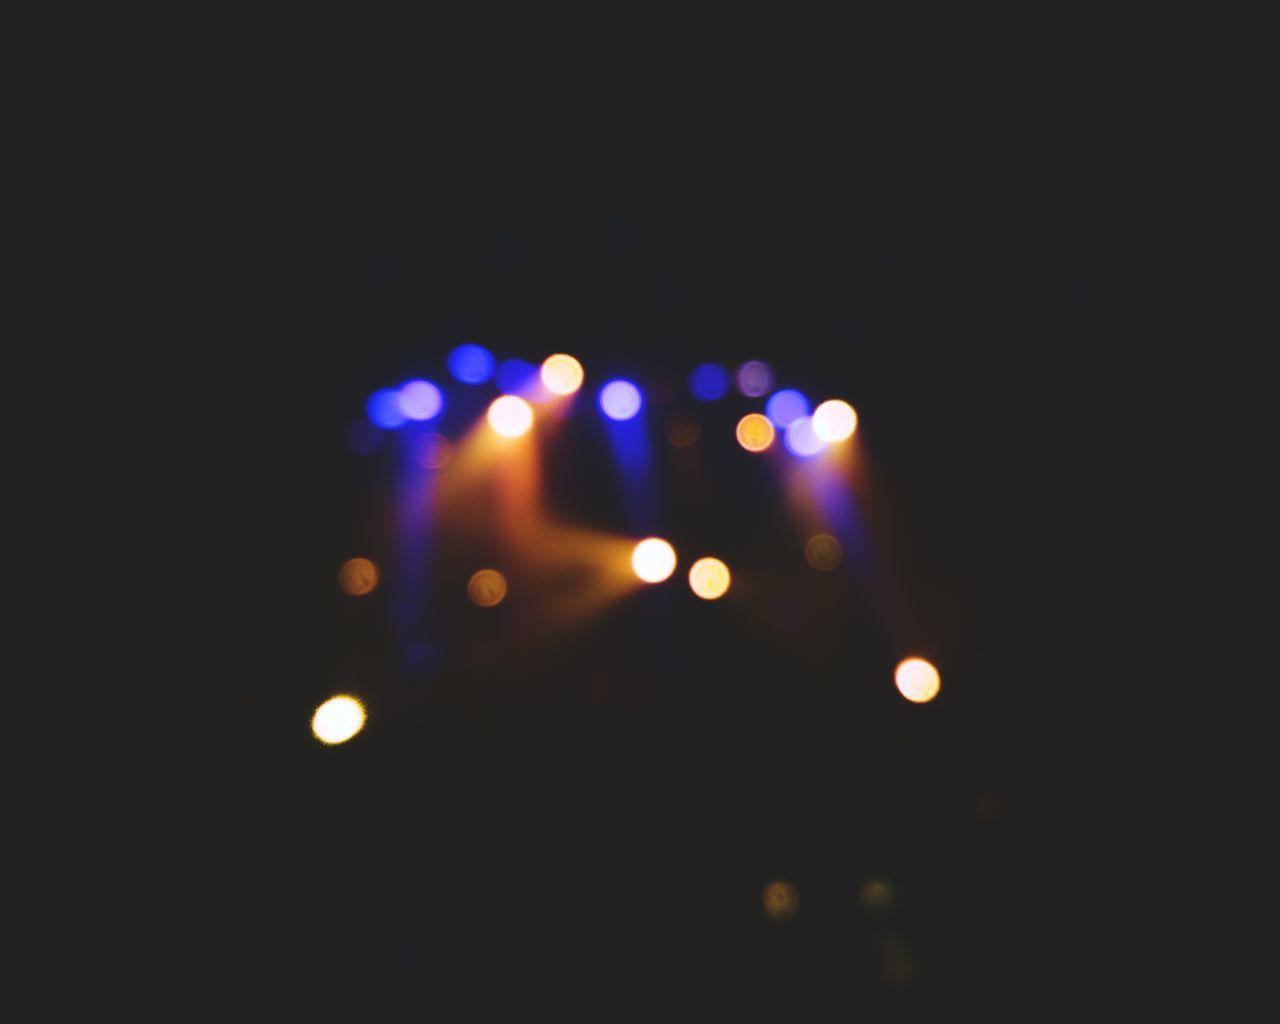 Illuminated Night Defocused No People Outdoors City Close-up Bokeh Lights Getty Images EyeEm Team Bokeh Bokeh Photography Projection Equipment Disco Lights Lighting Equipment Fiber Optic Multi Colored Pattern Technology EyeEm Selects Neon Life